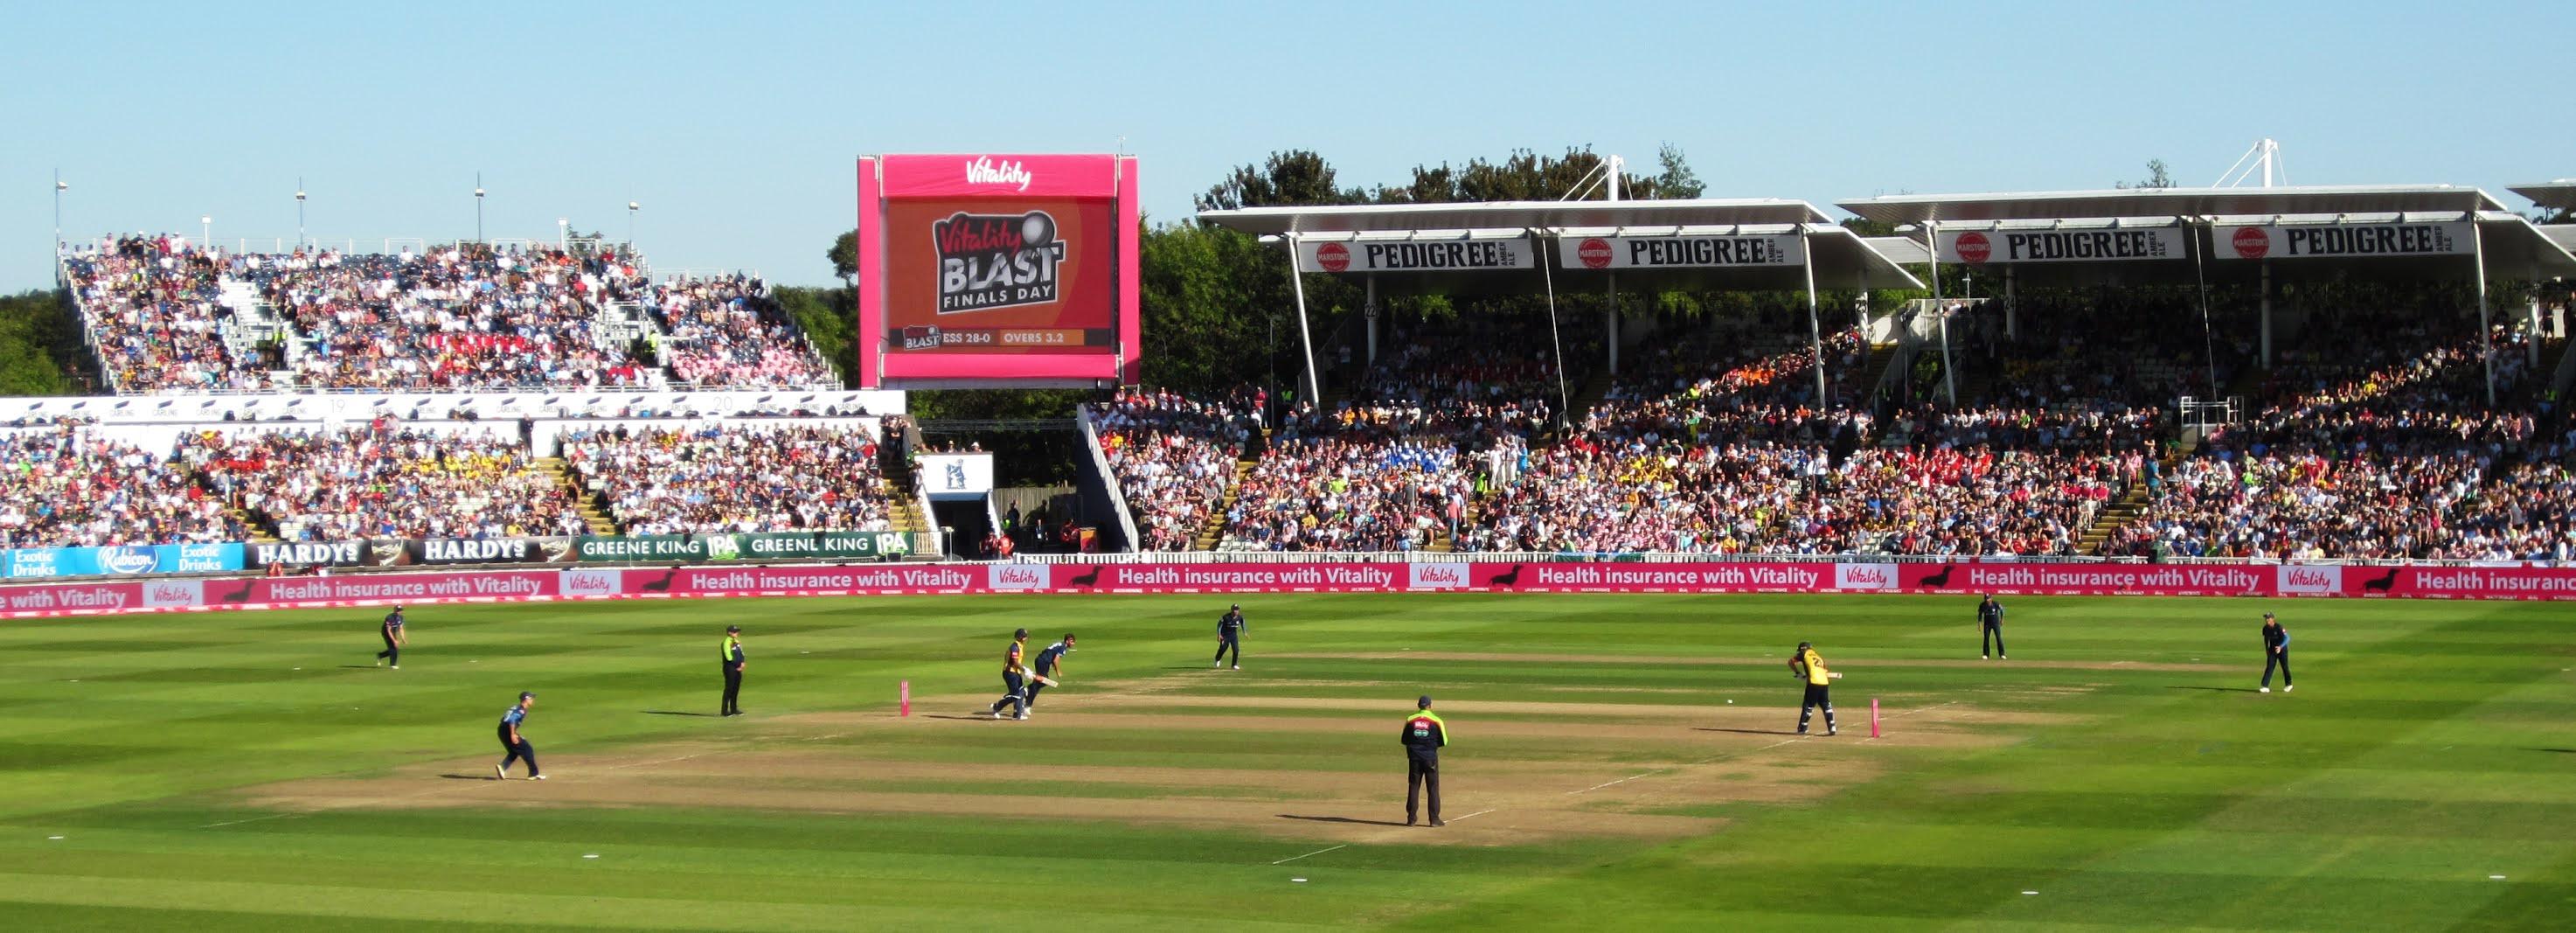 Essex Eagles batting during the 2019 Vitality Blast semi final